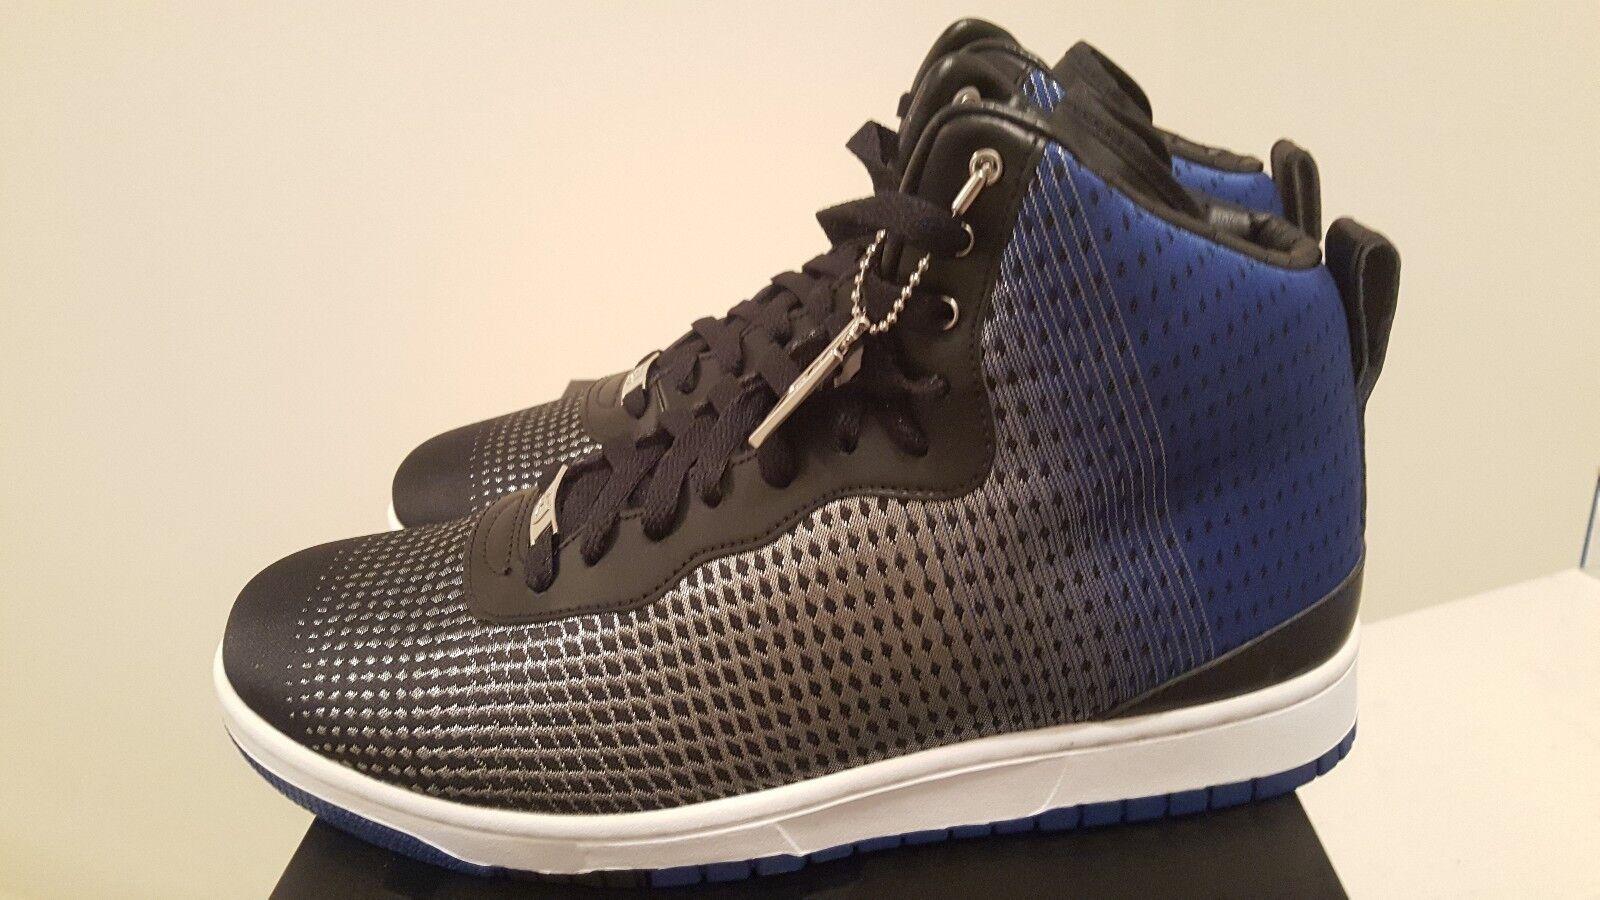 Nike KD Vlll 8 NSW Lifestyle Met Silver GM Royal  10.5  Sample Basketball Shoes